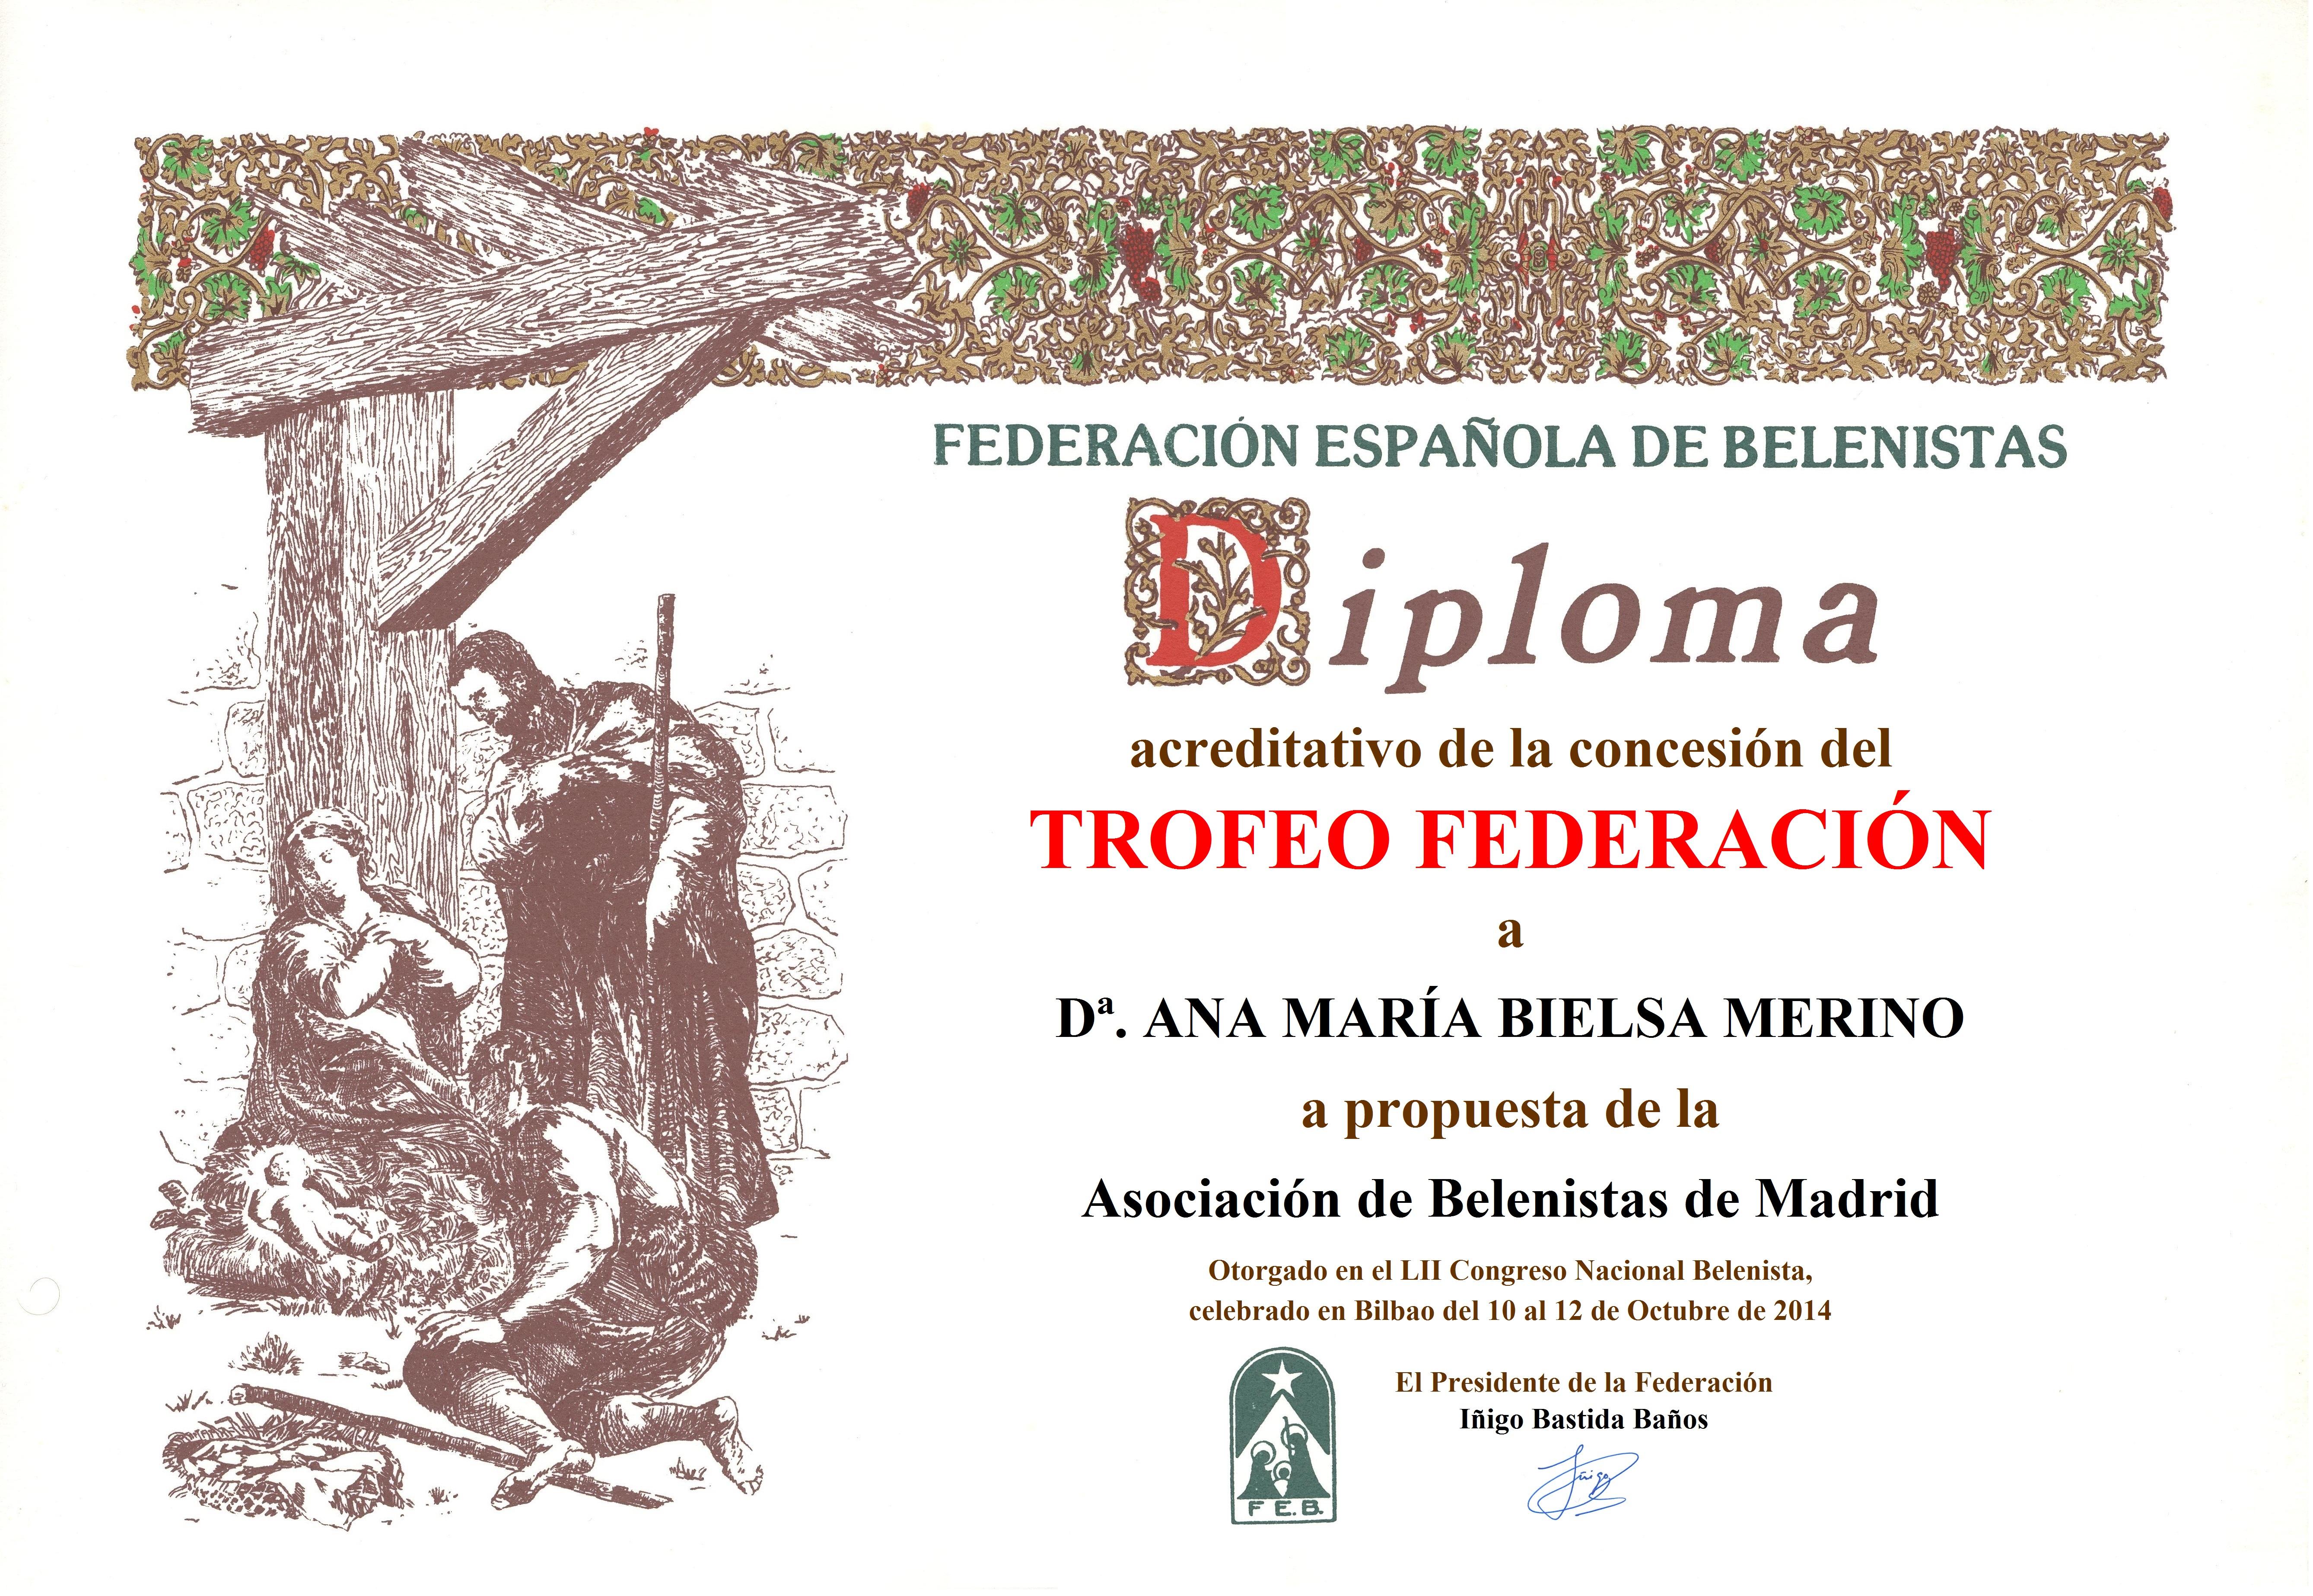 Diploma Trofeo FEB 2014 Ana María Bielsa Merino